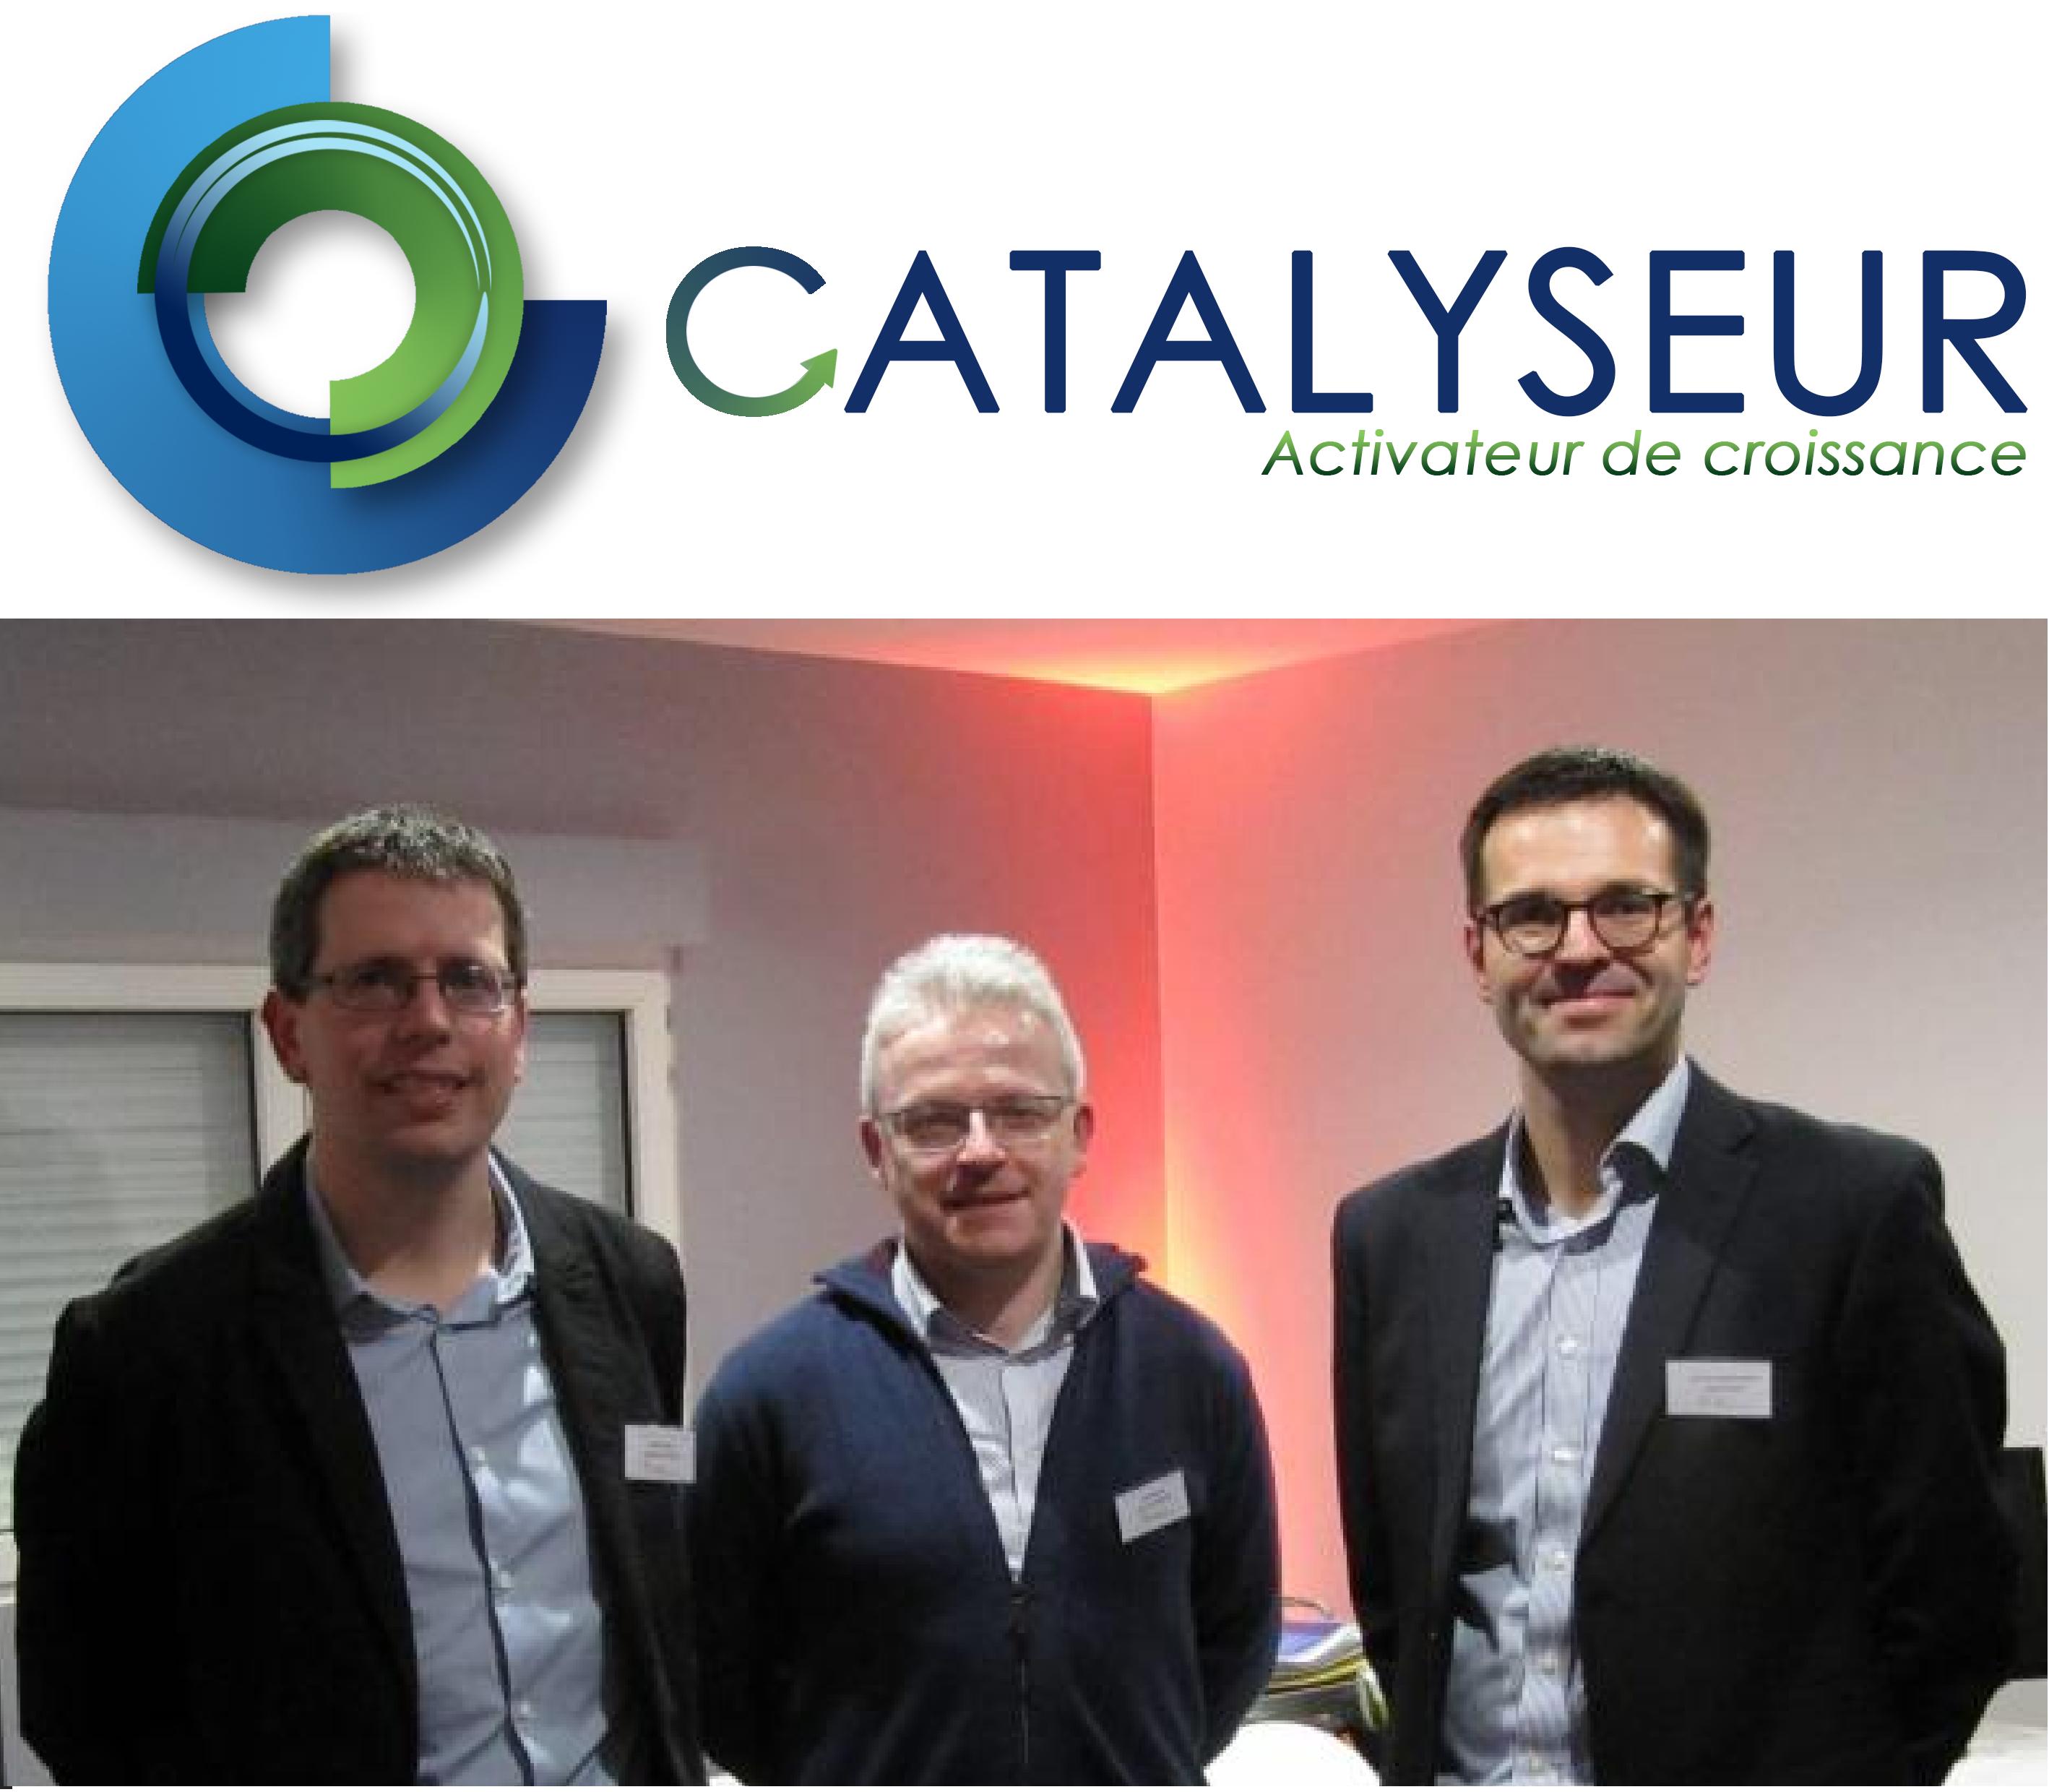 Catalyseur Carpoiquet Caen